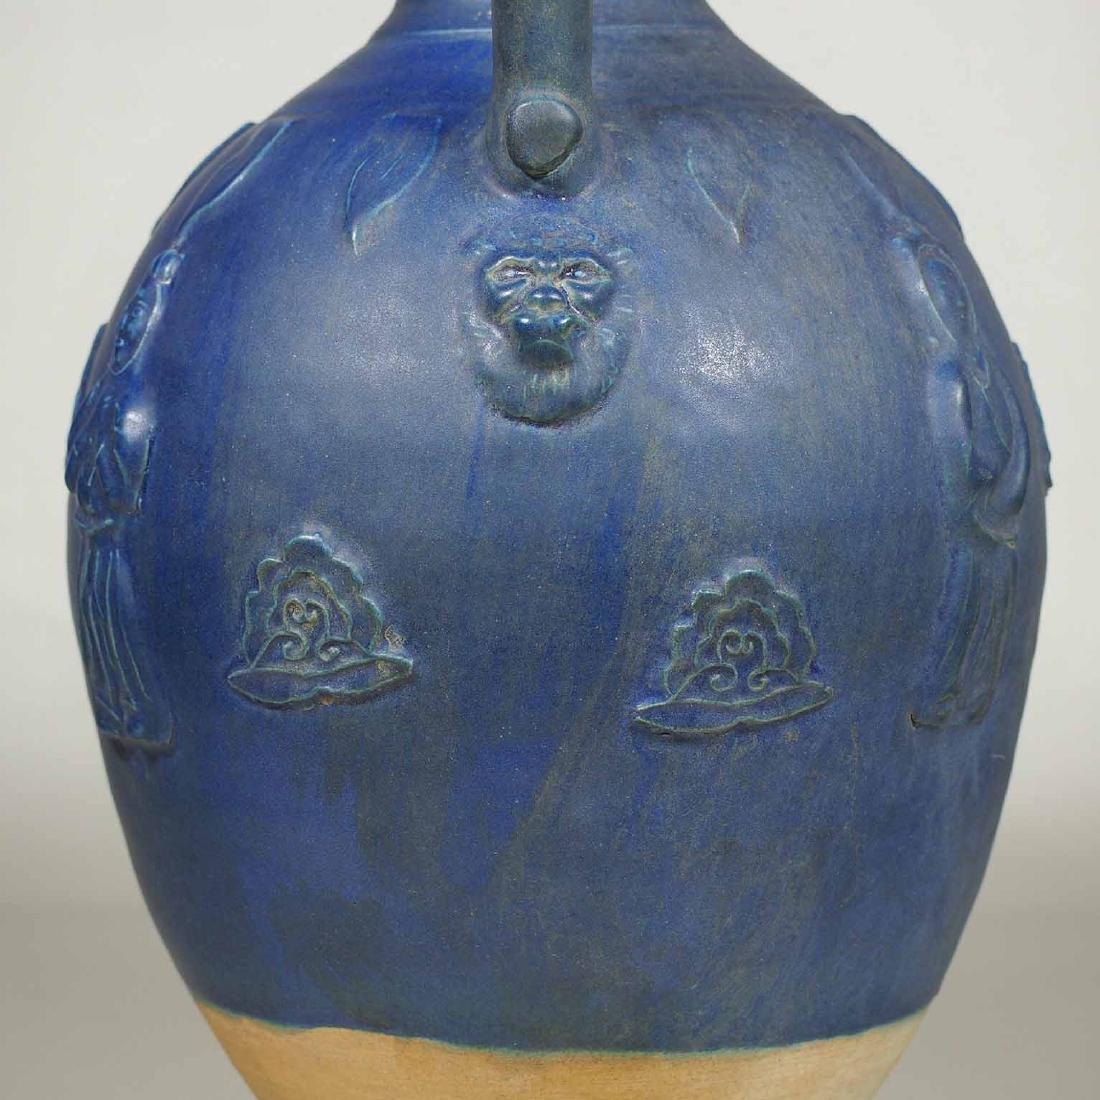 Blue Glaze Amphora-form Vase, late Tang Dynasty - 6